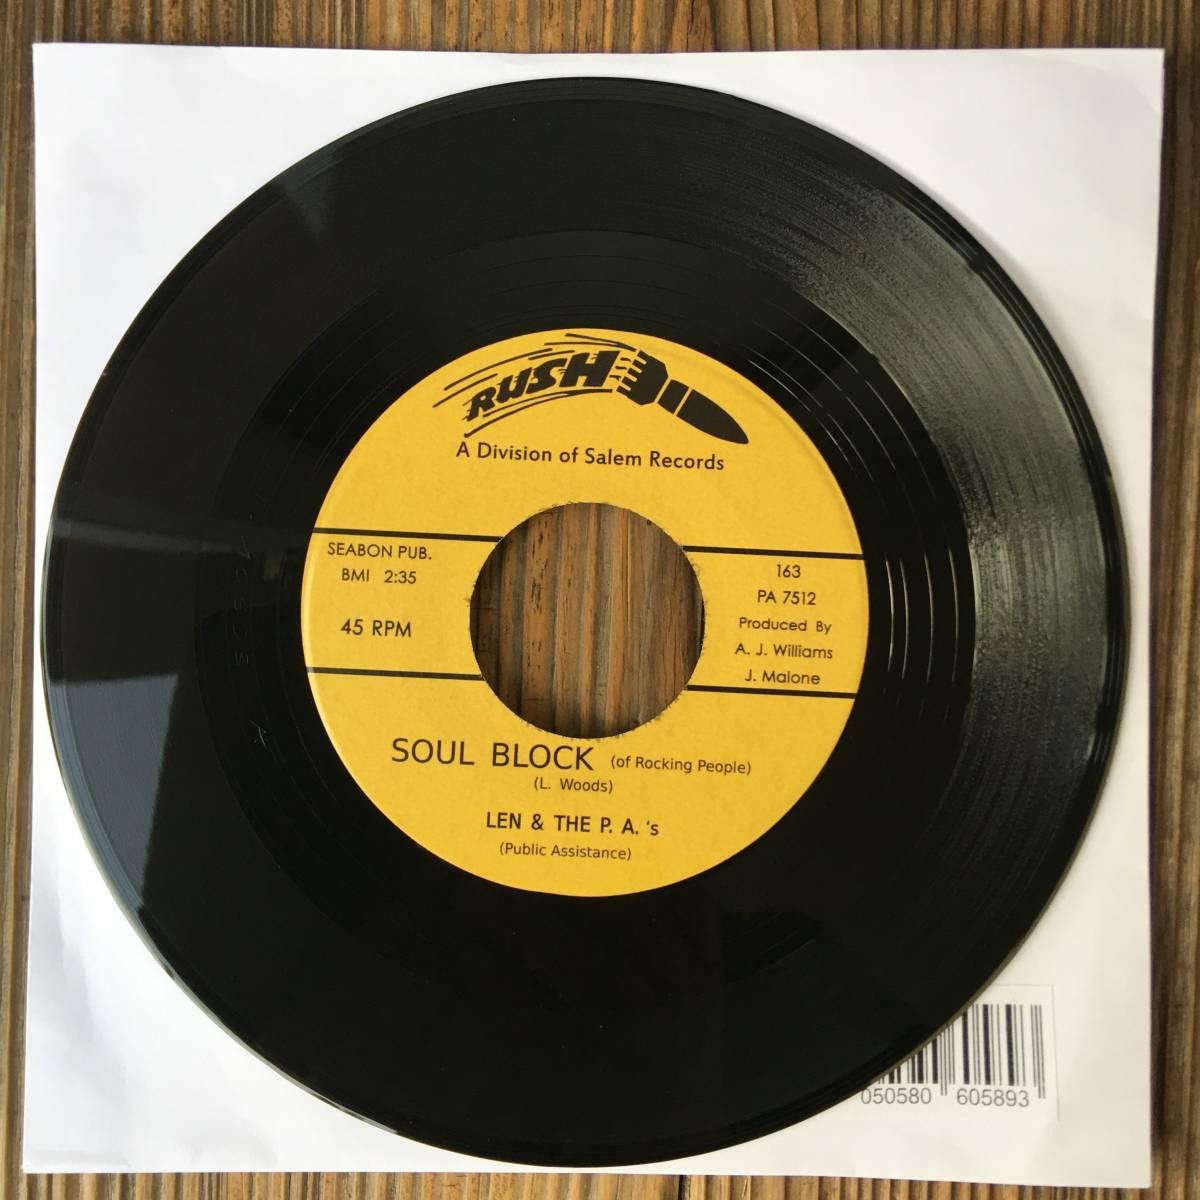 【送料無料!新品7inch!Killer Female Funk!】Len & The P.A.'s (Public Assistance) - Soul Block (Of Rocking People) / Believe Me